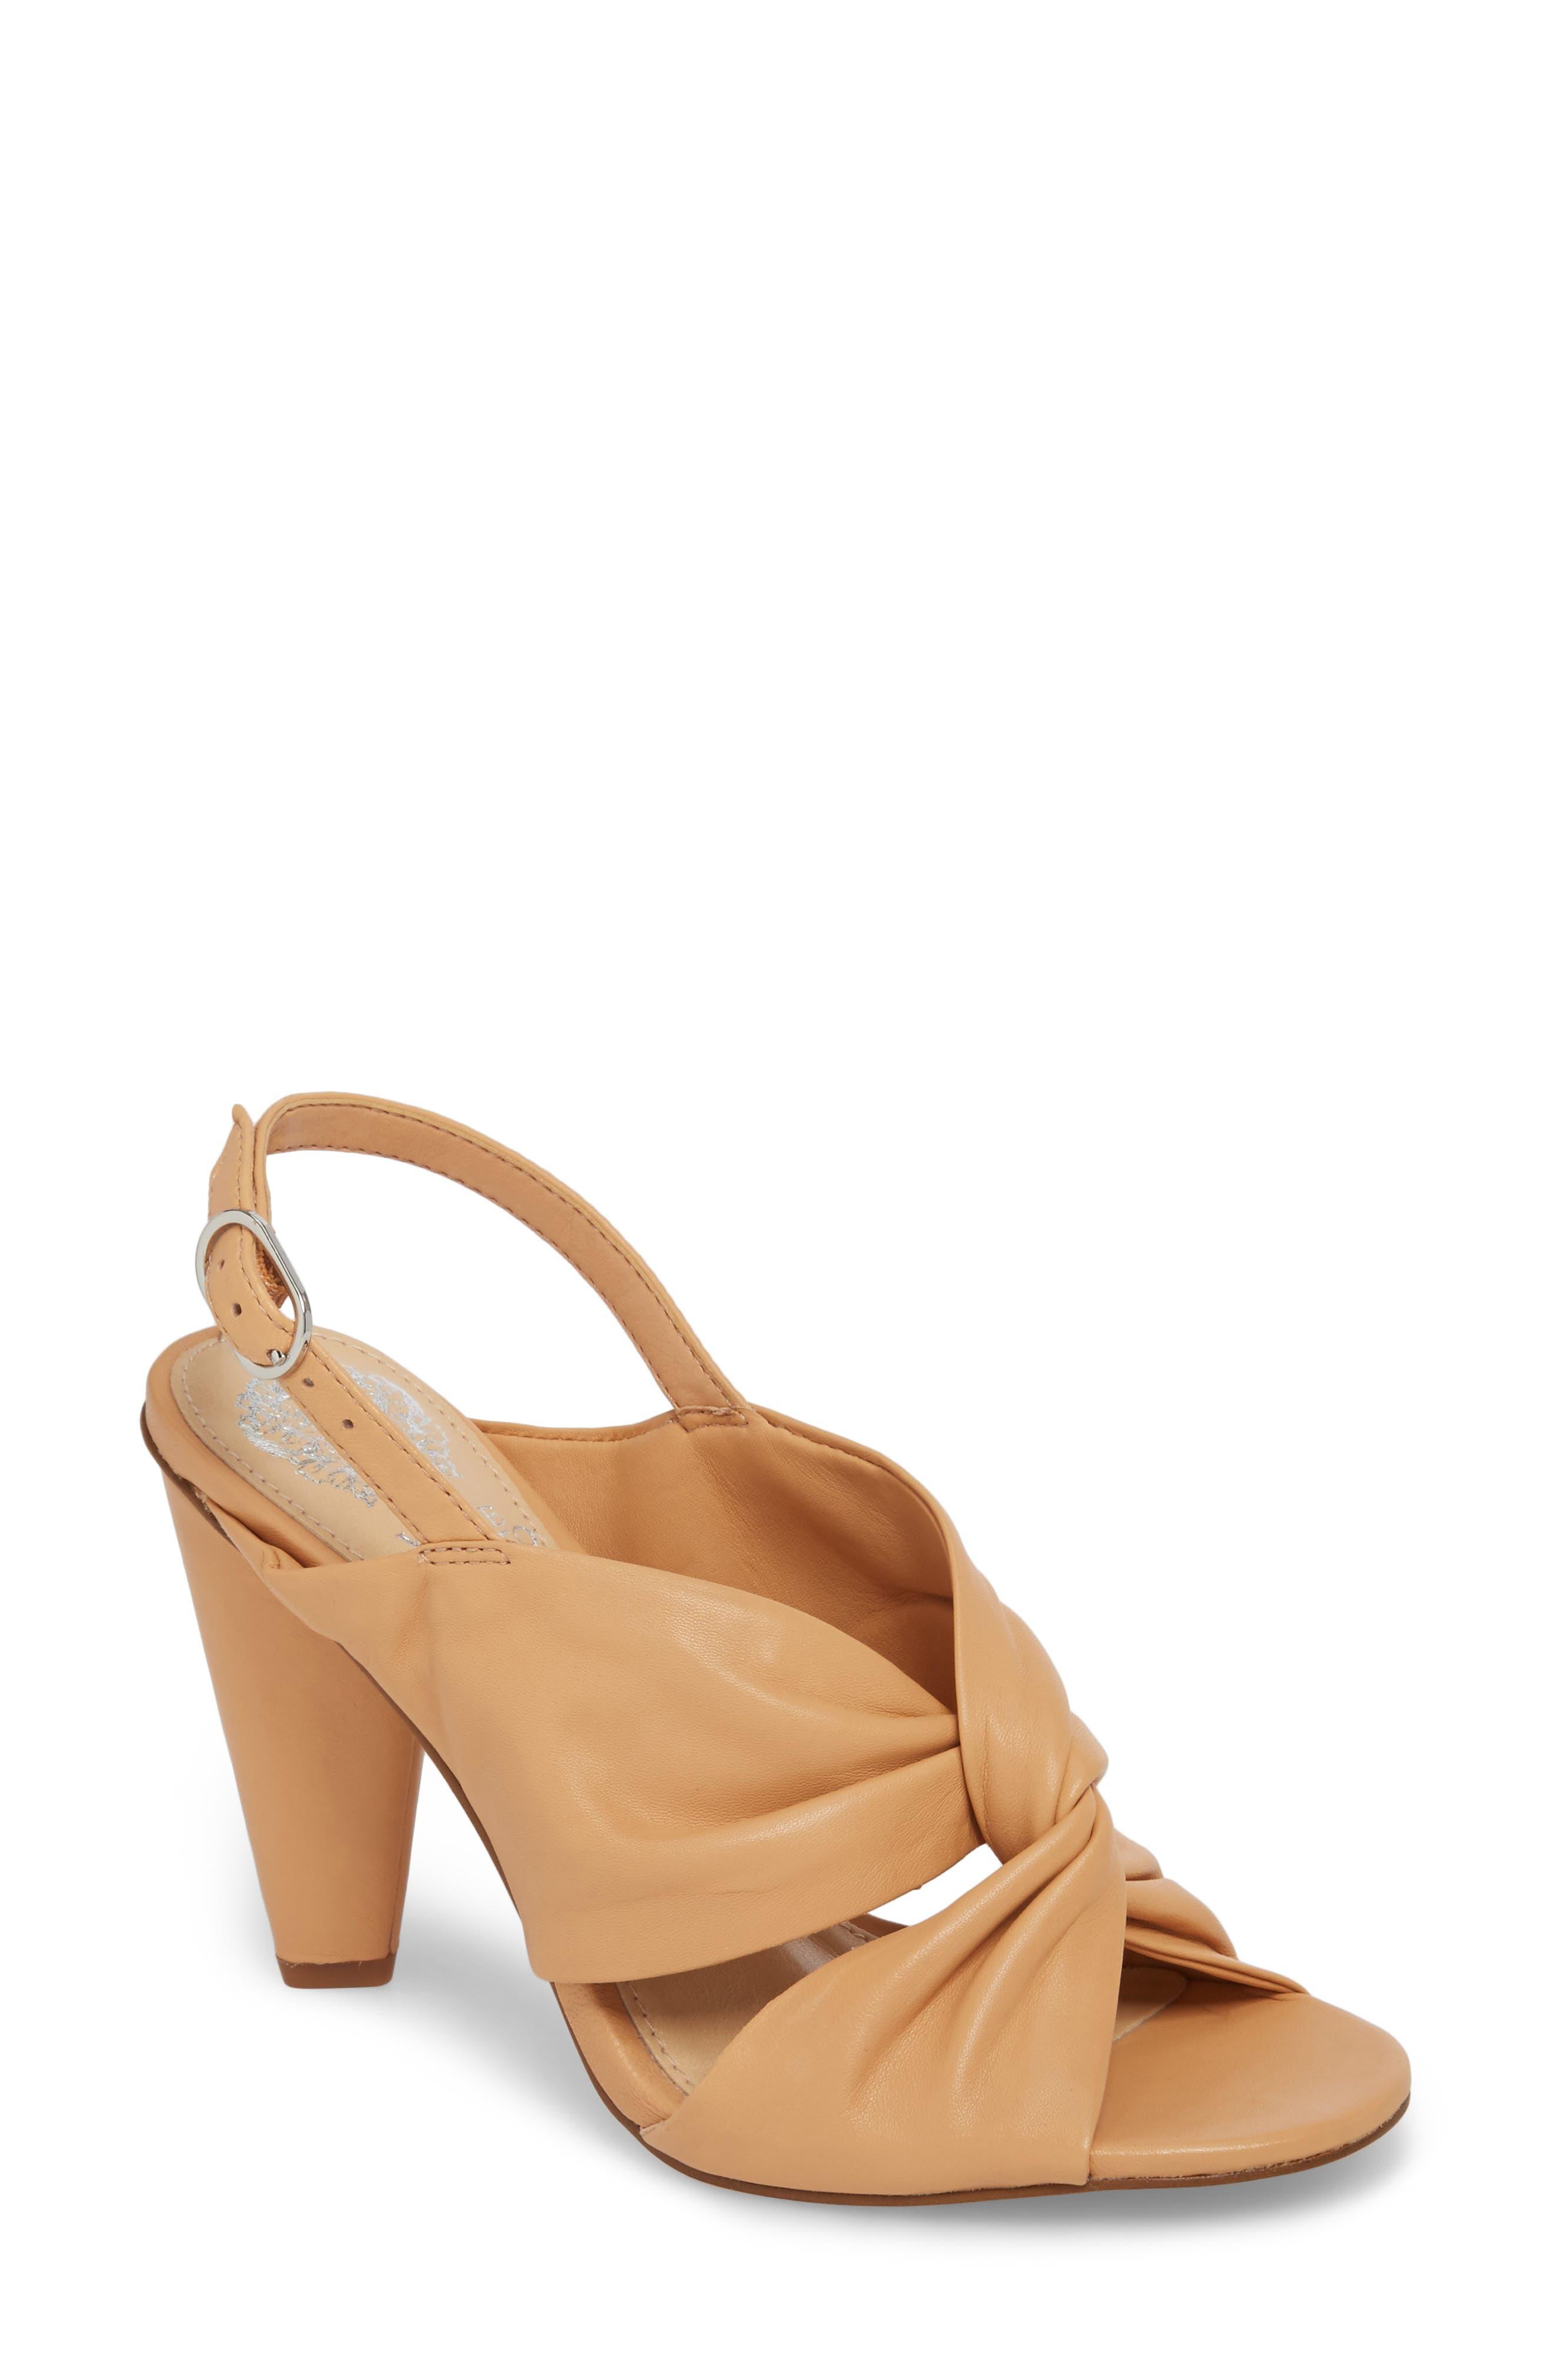 Kattie Slingback Sandal,                         Main,                         color, Privacy Leather